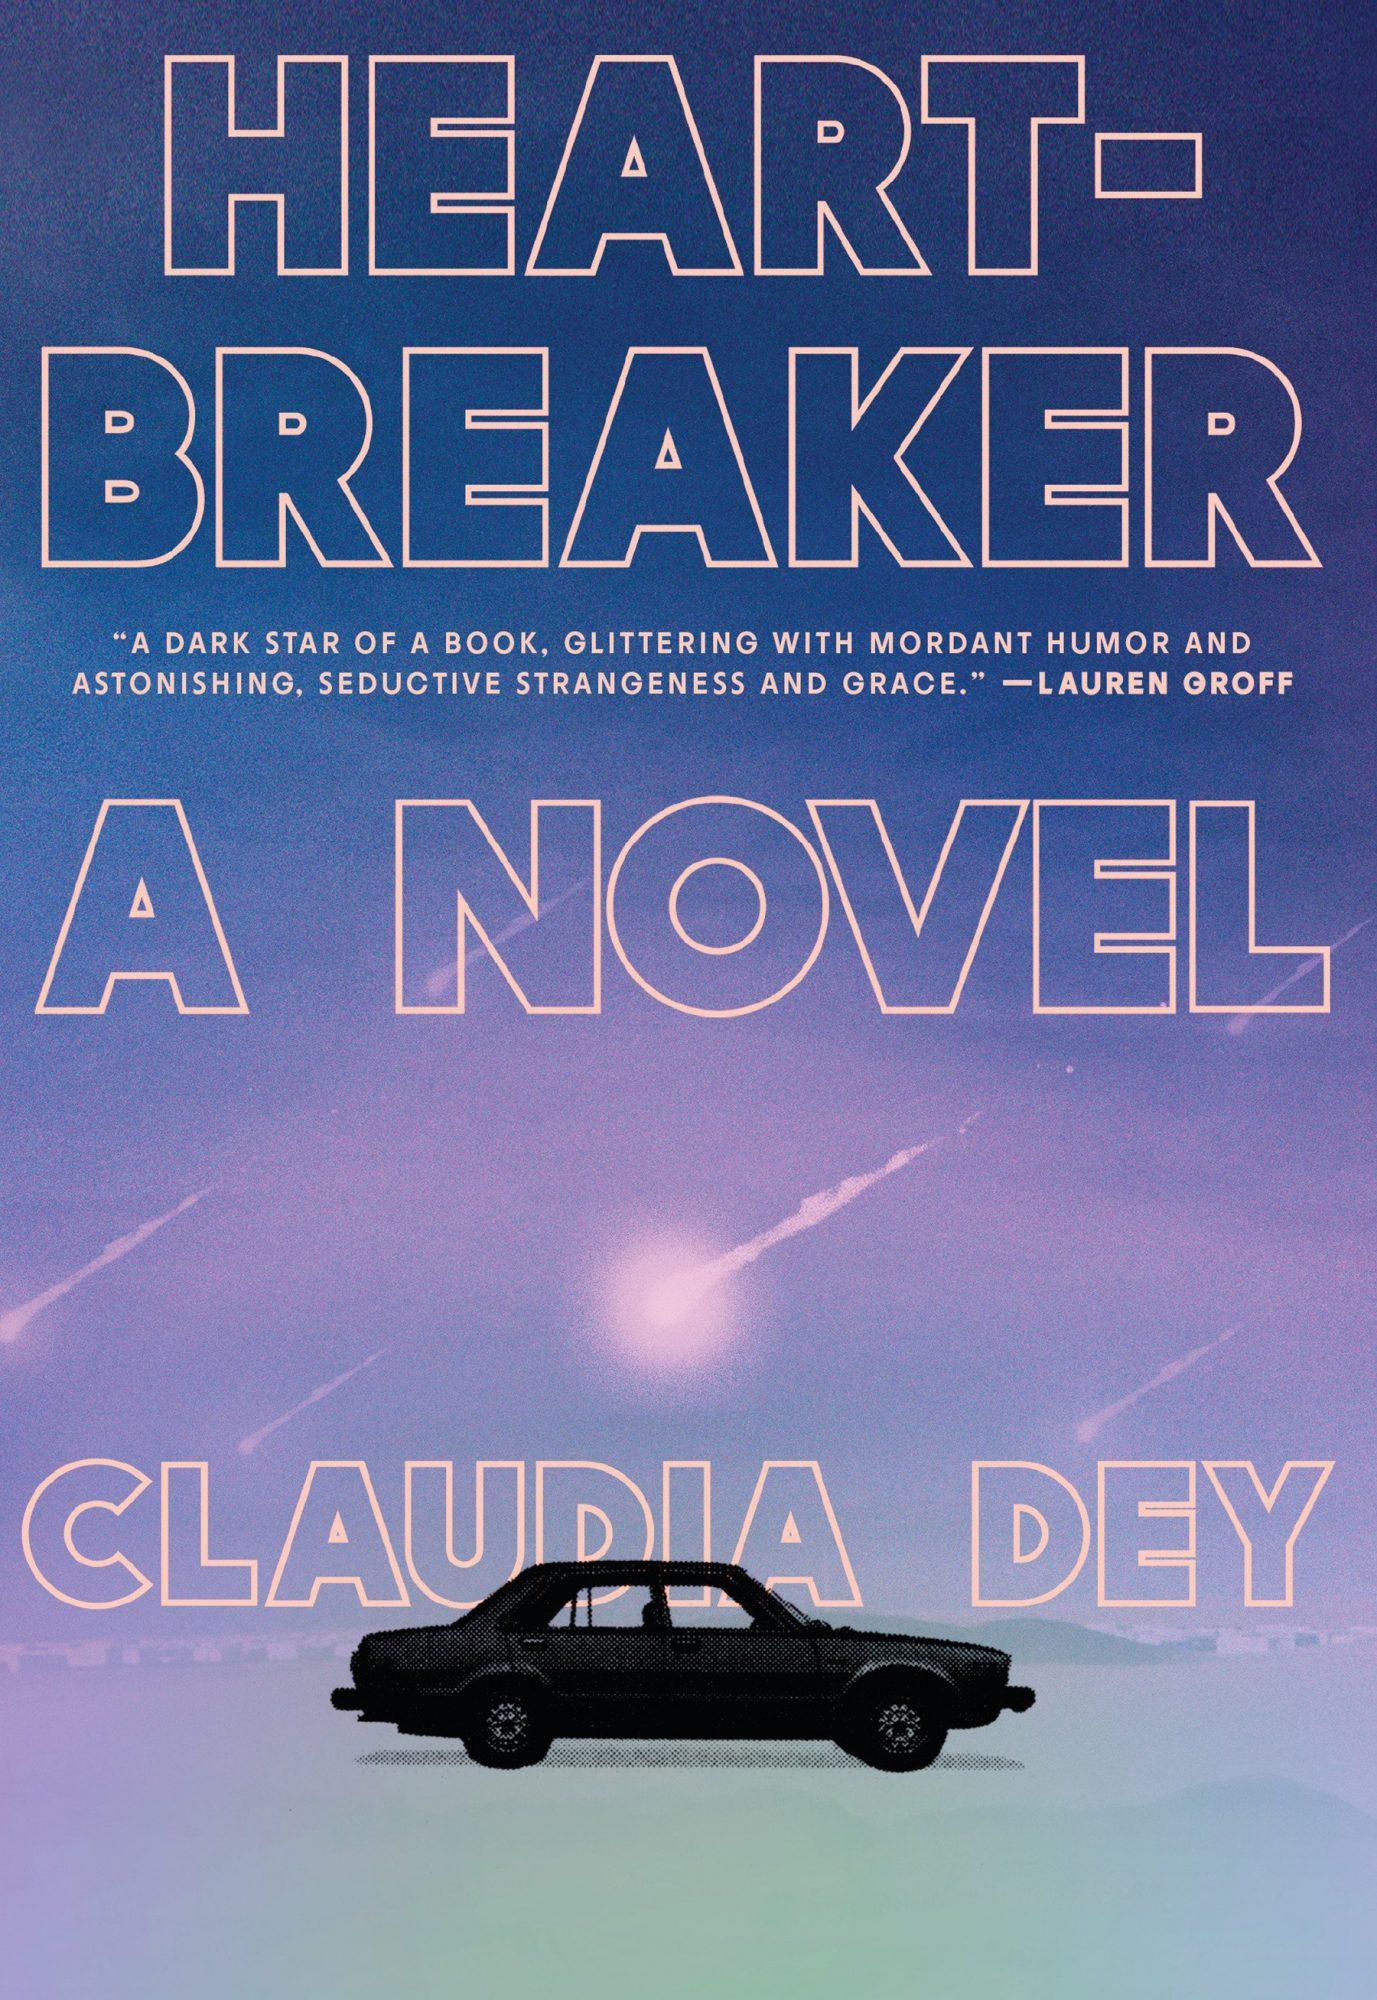 Heartbreaker: A Novel  by Claudia Dey  Random House